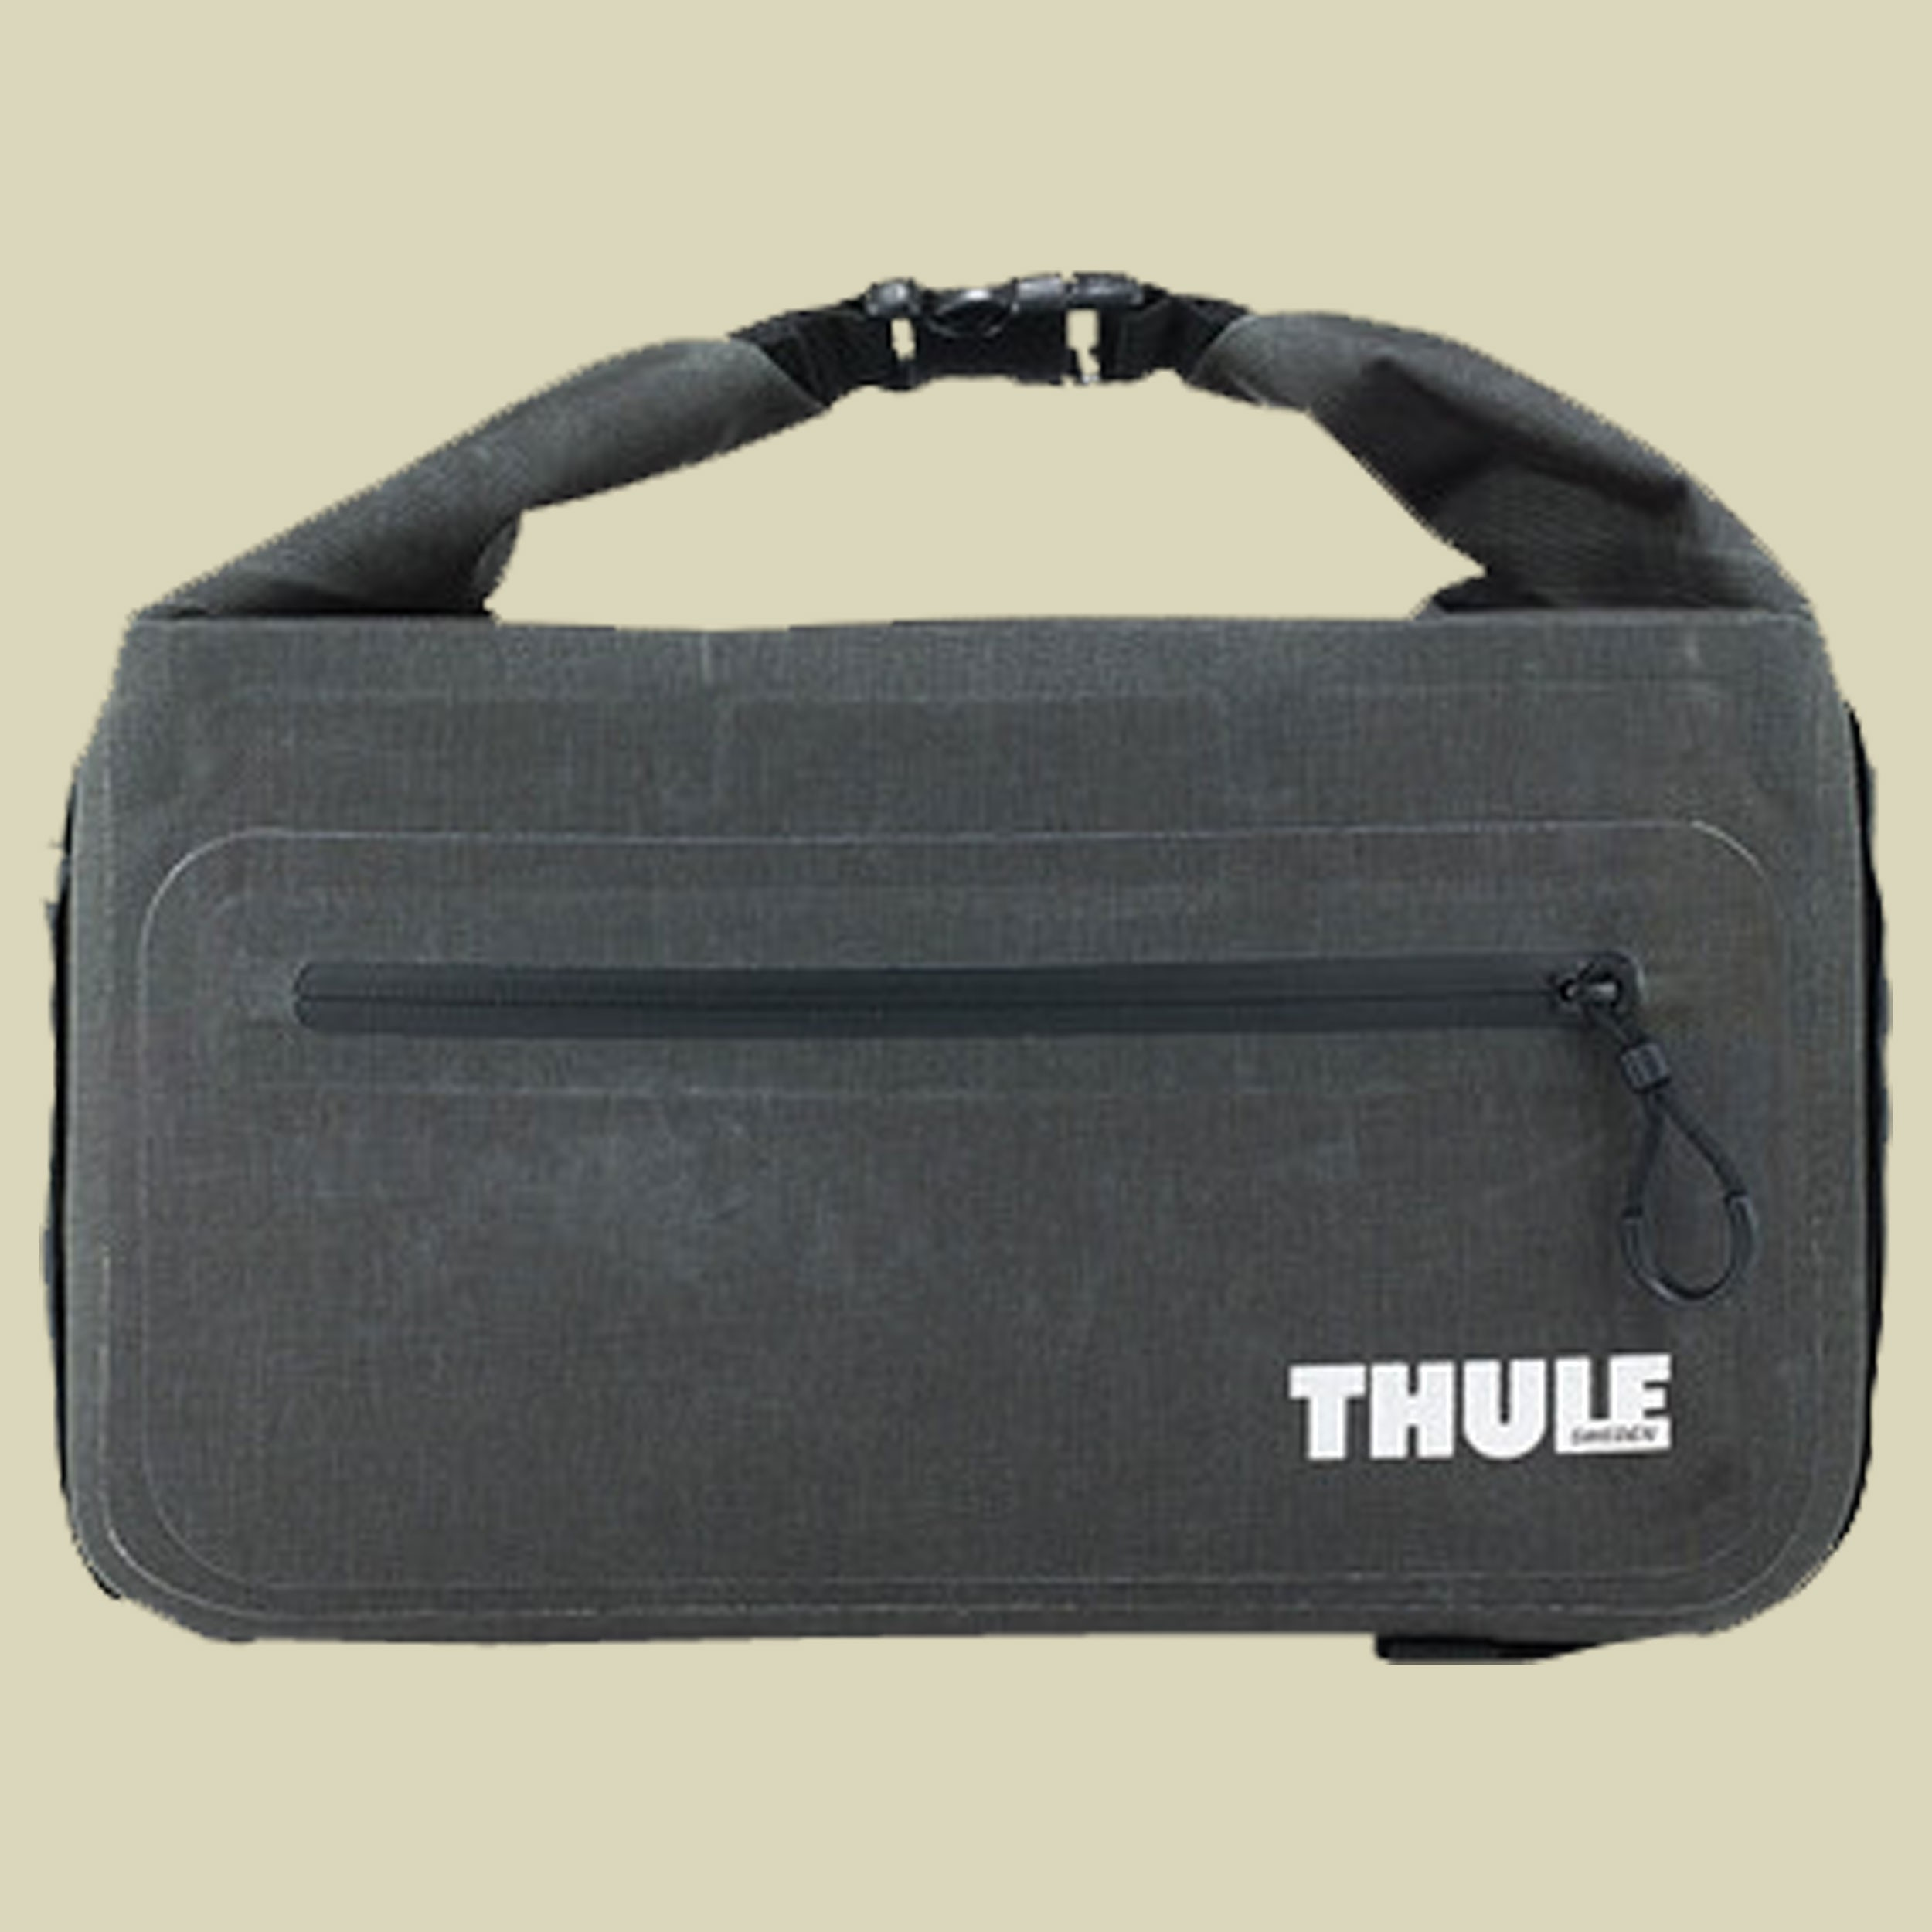 thule_trunk_bag_gepaecktraegertasche_front_fallback